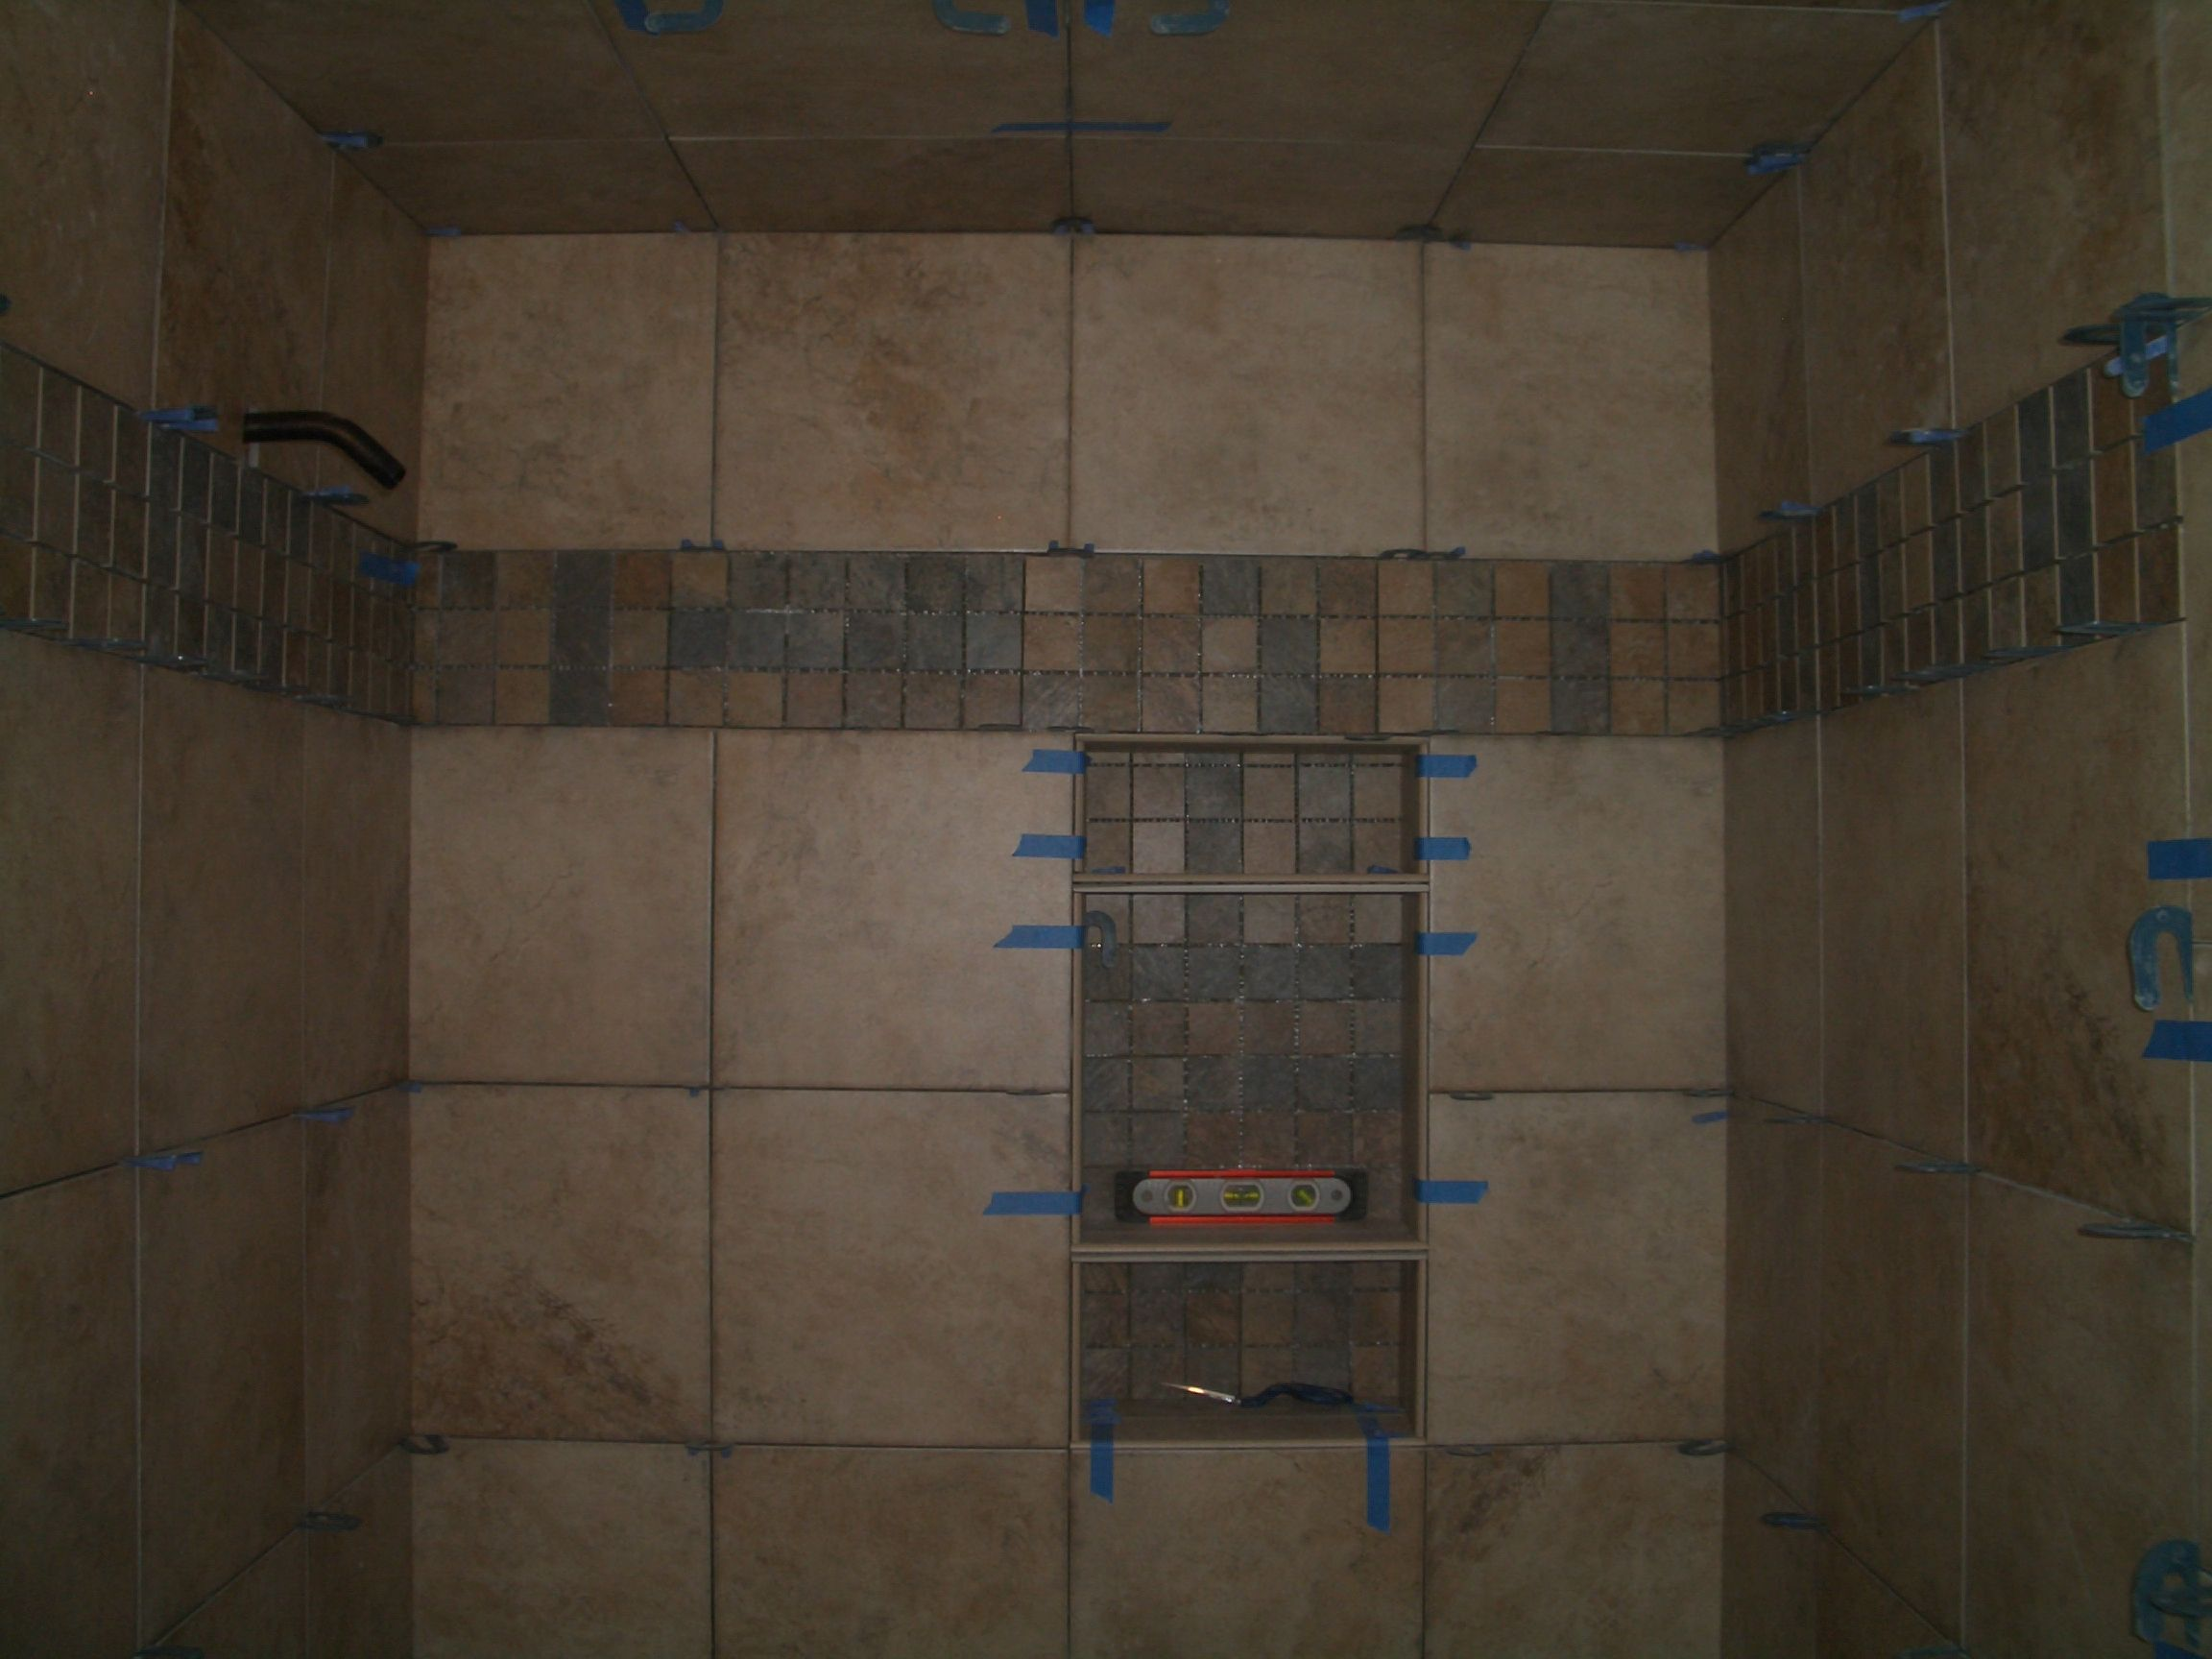 Shower tiles Bathroom Remodel Ideas Tile installation